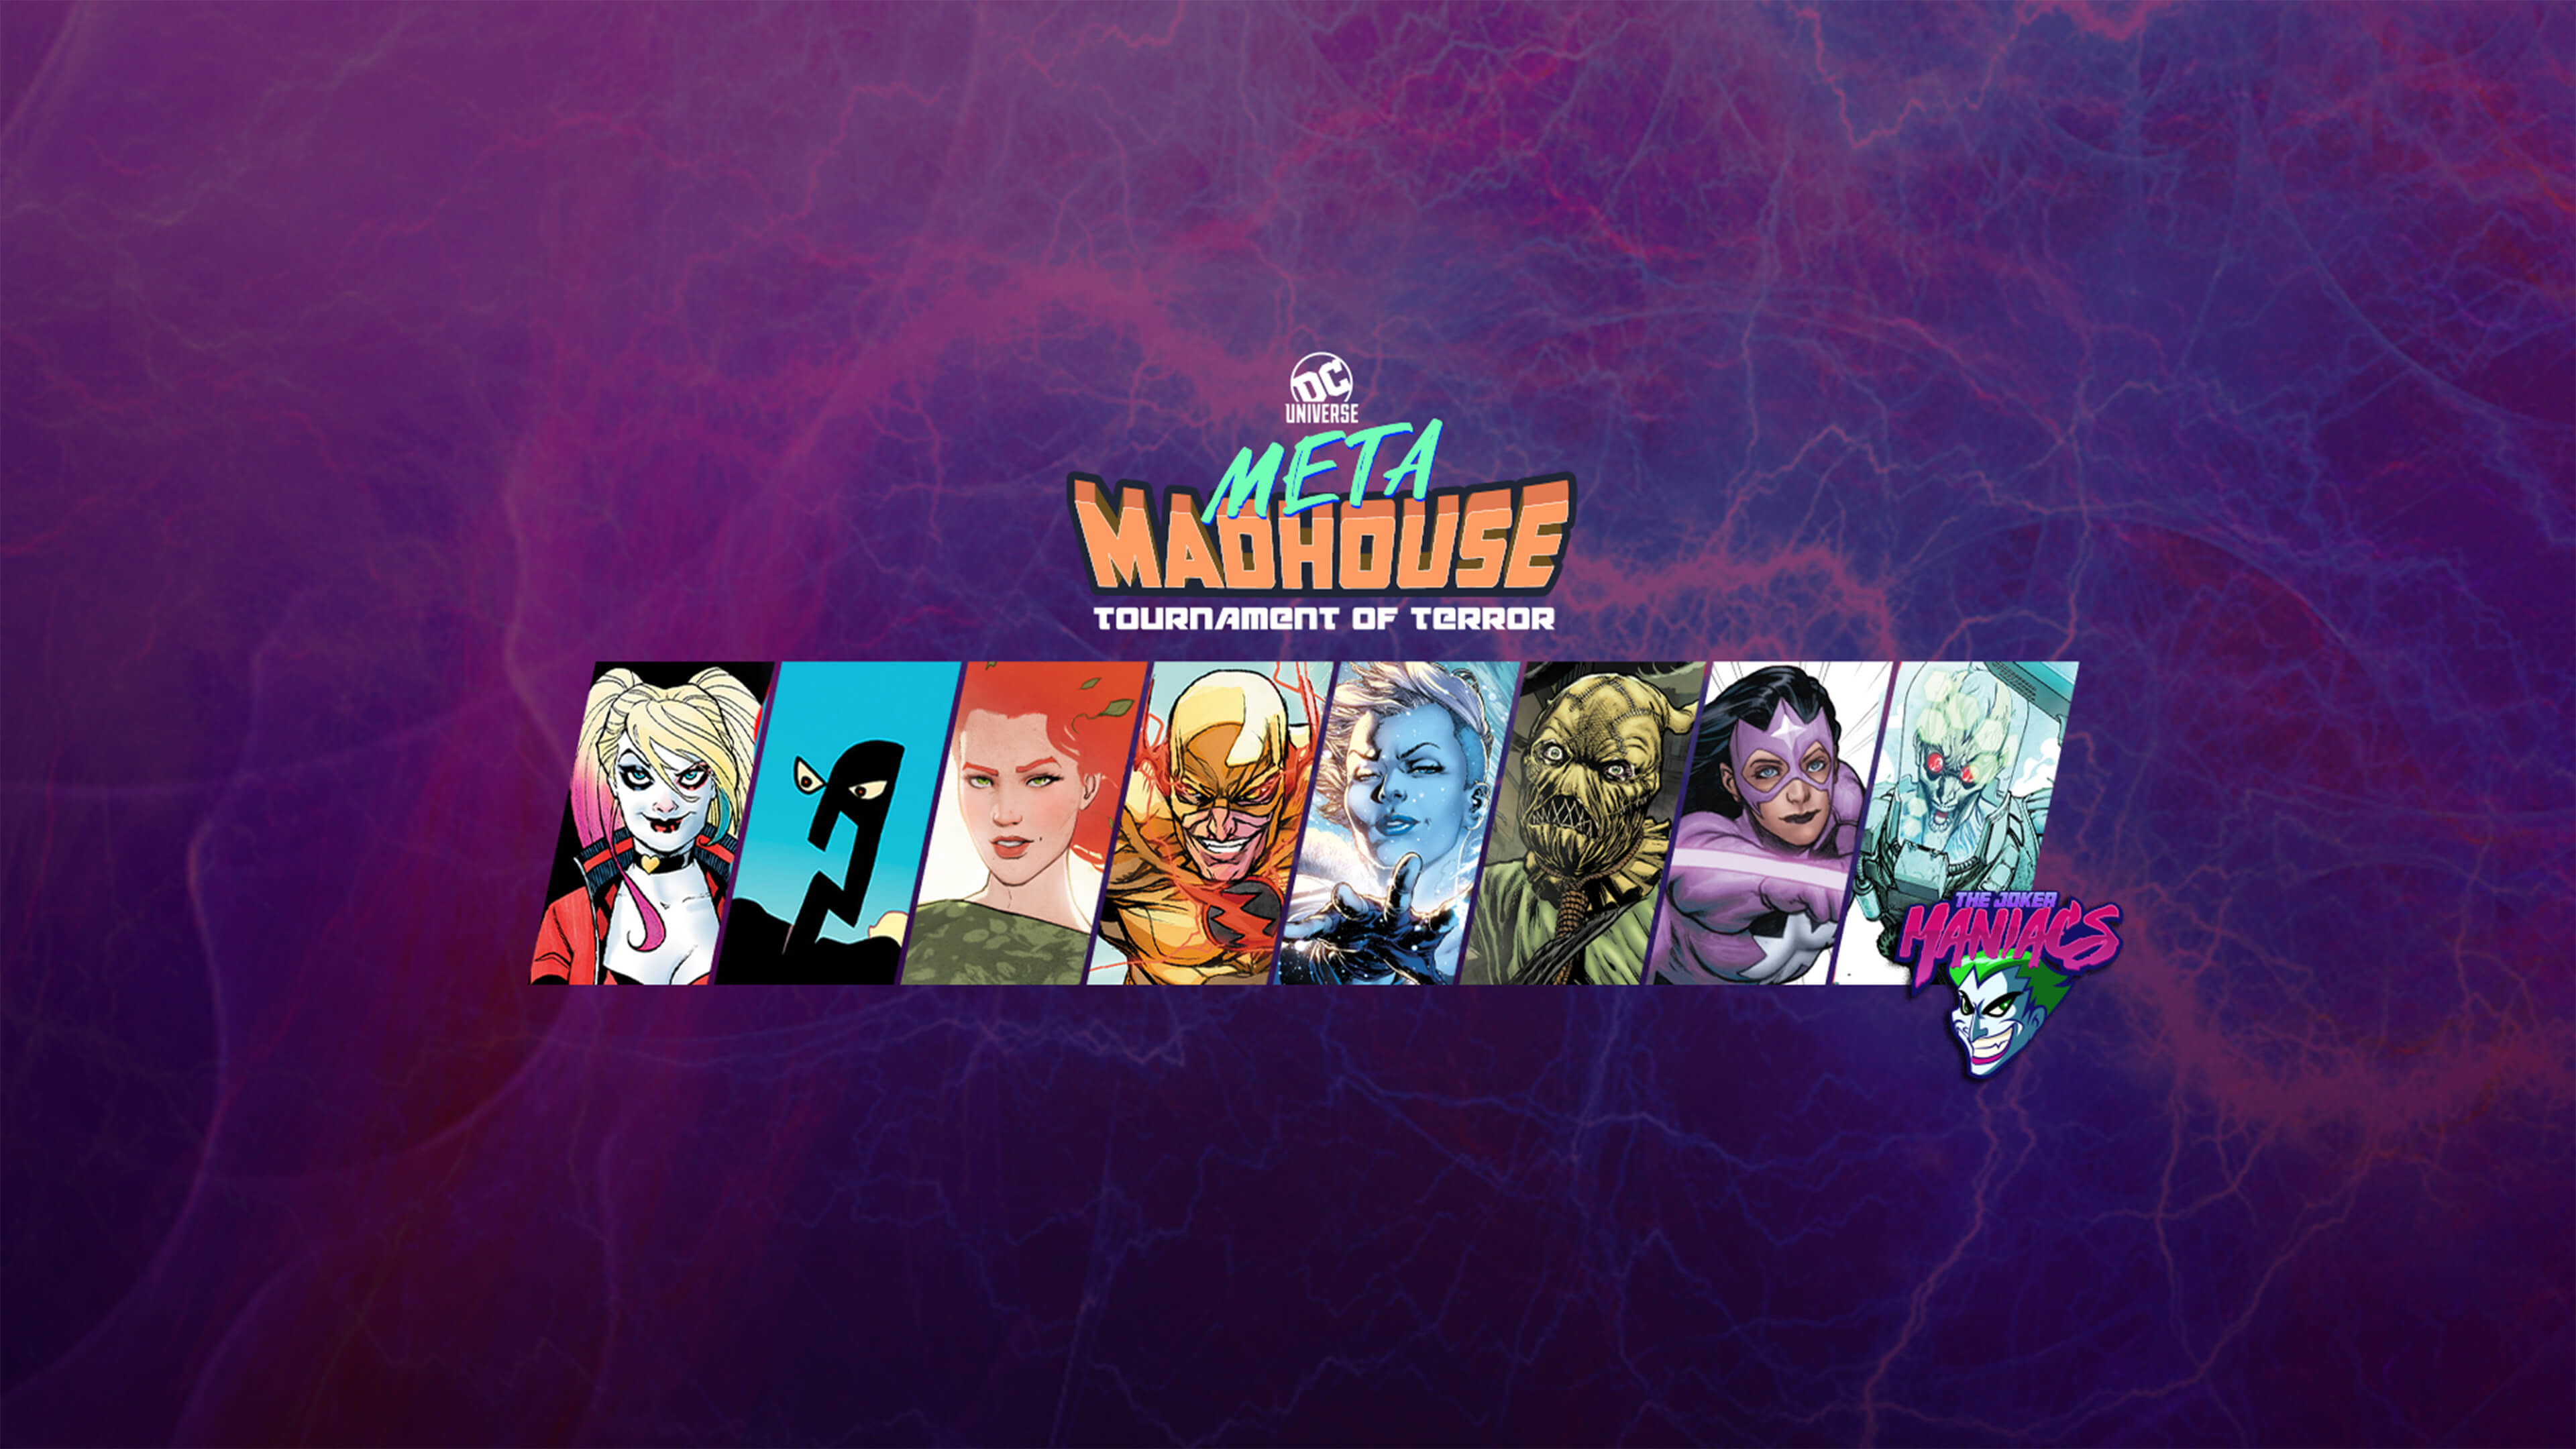 MM_JOKER VOTE_8 players_hero-c2-2.jpg